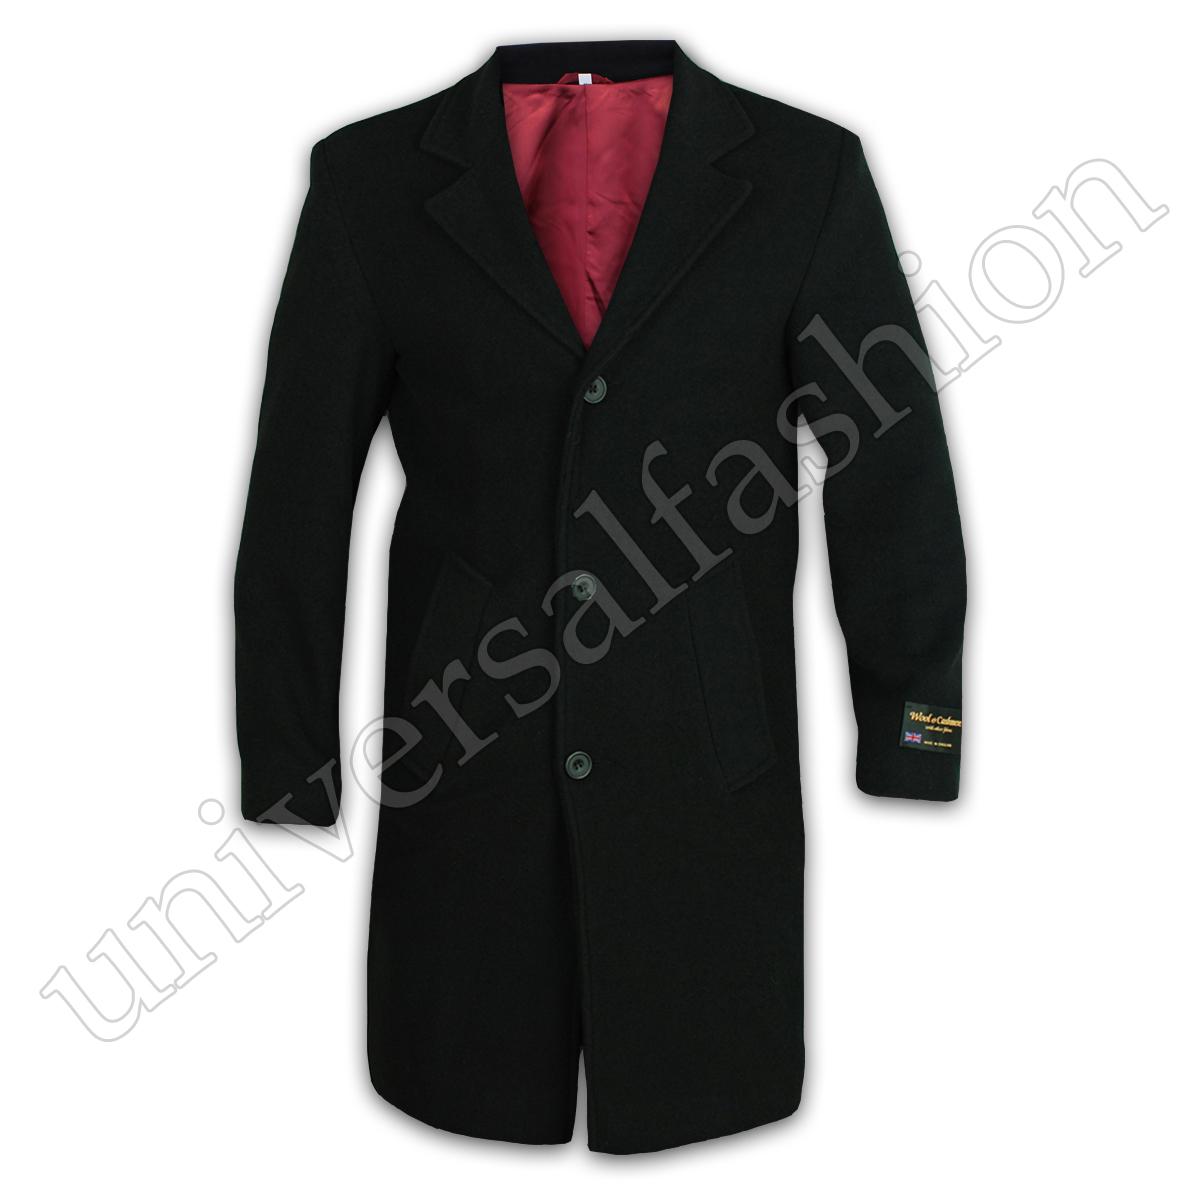 herren wolle kaschmir mantel jacke oberbekleidung. Black Bedroom Furniture Sets. Home Design Ideas